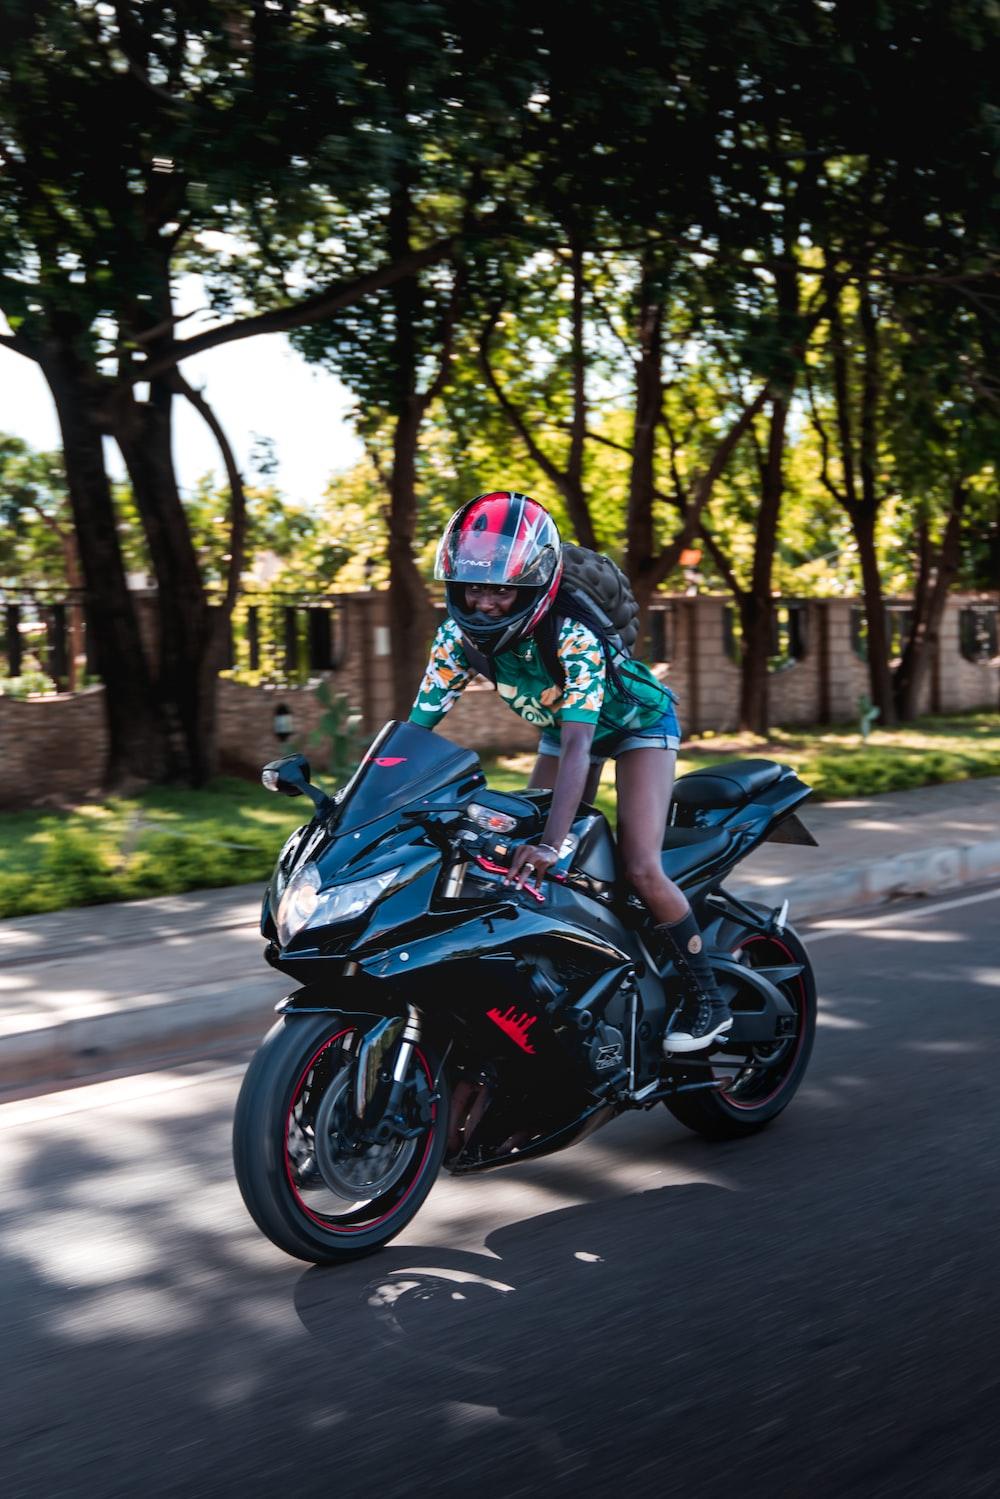 woman on black sport motorcycle in street